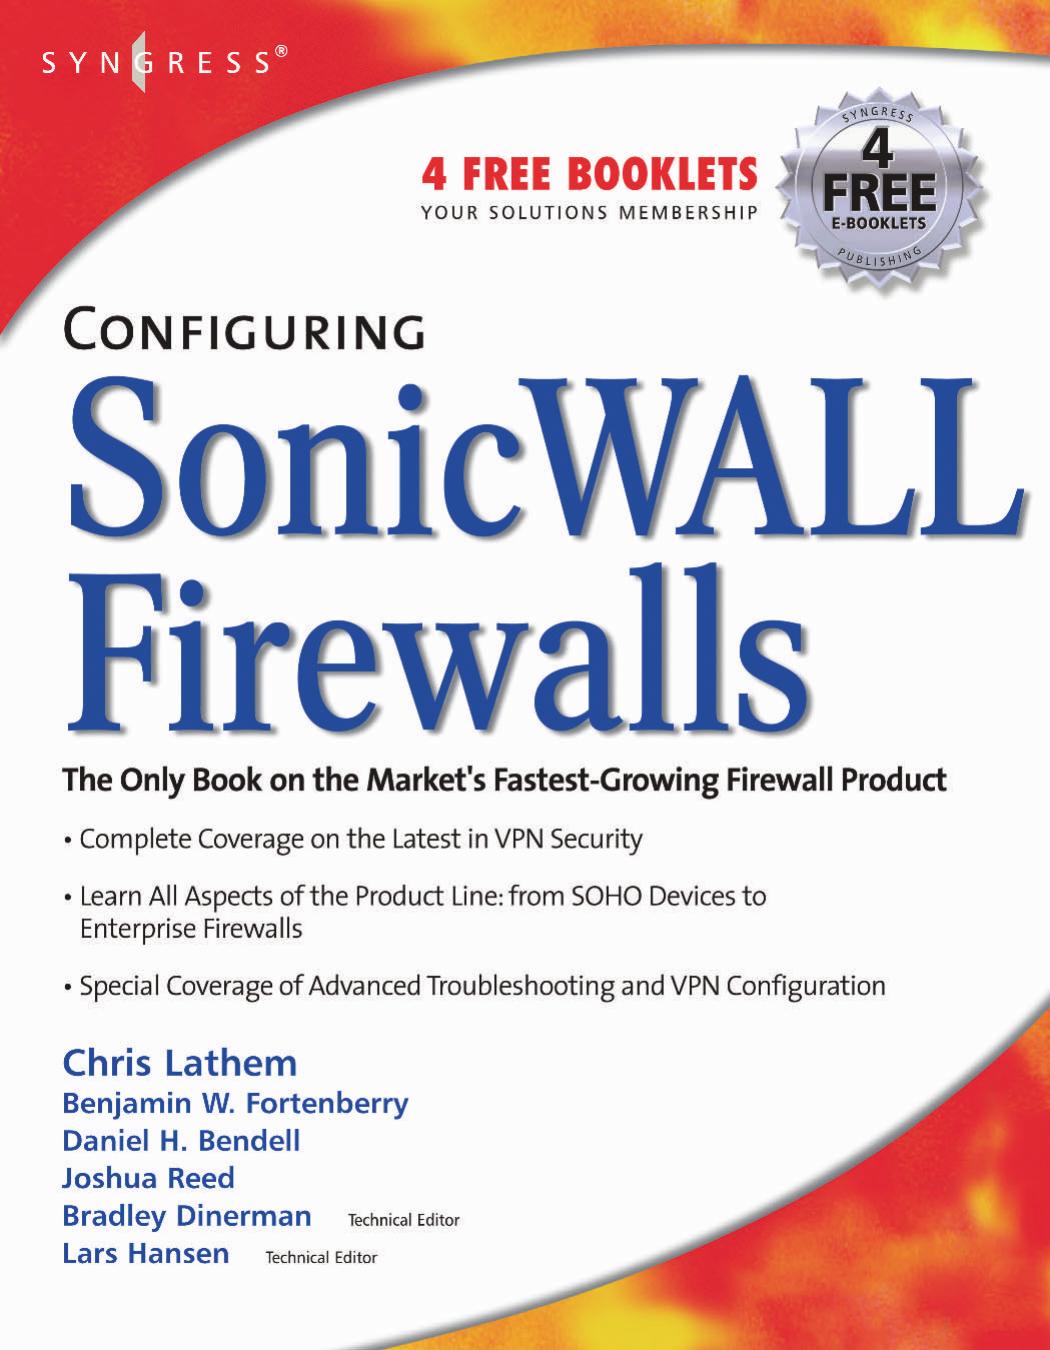 Configuring SonicWALL Firewalls | manualzz com